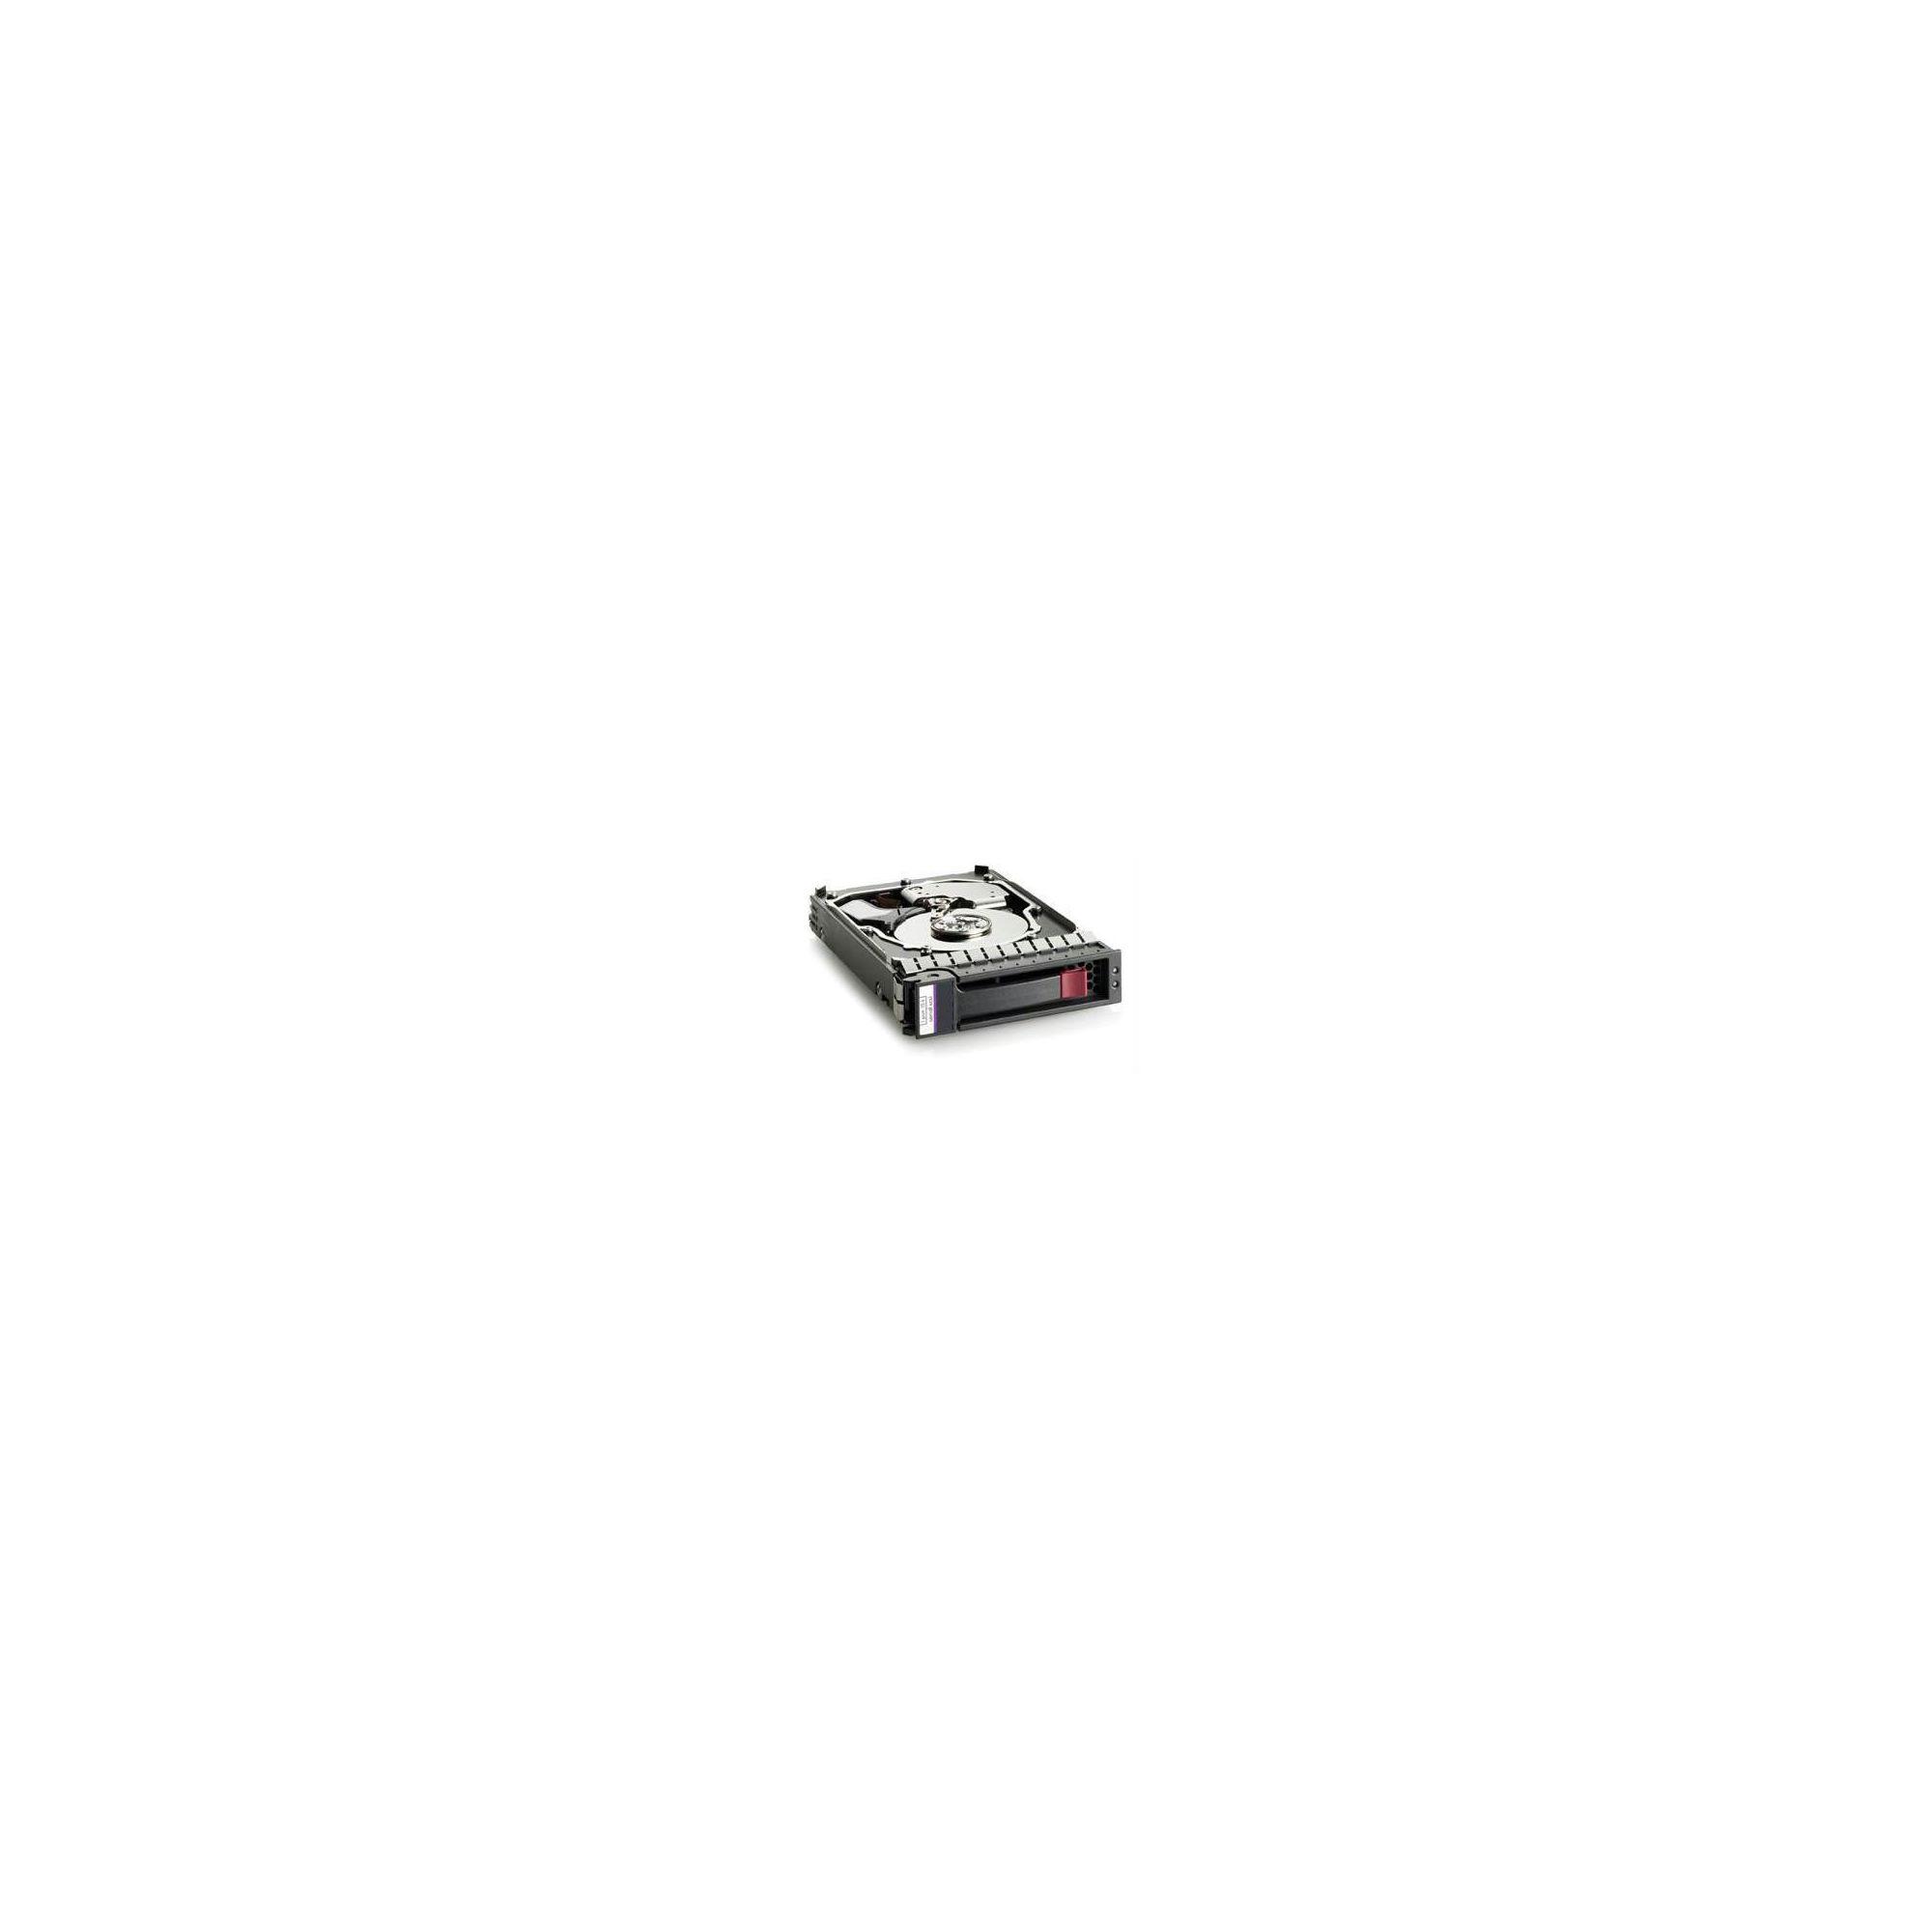 Hewlett-Packard StorageWorks 146GB 3G 15K Dual-port SAS Hard Disk Drive at Tesco Direct